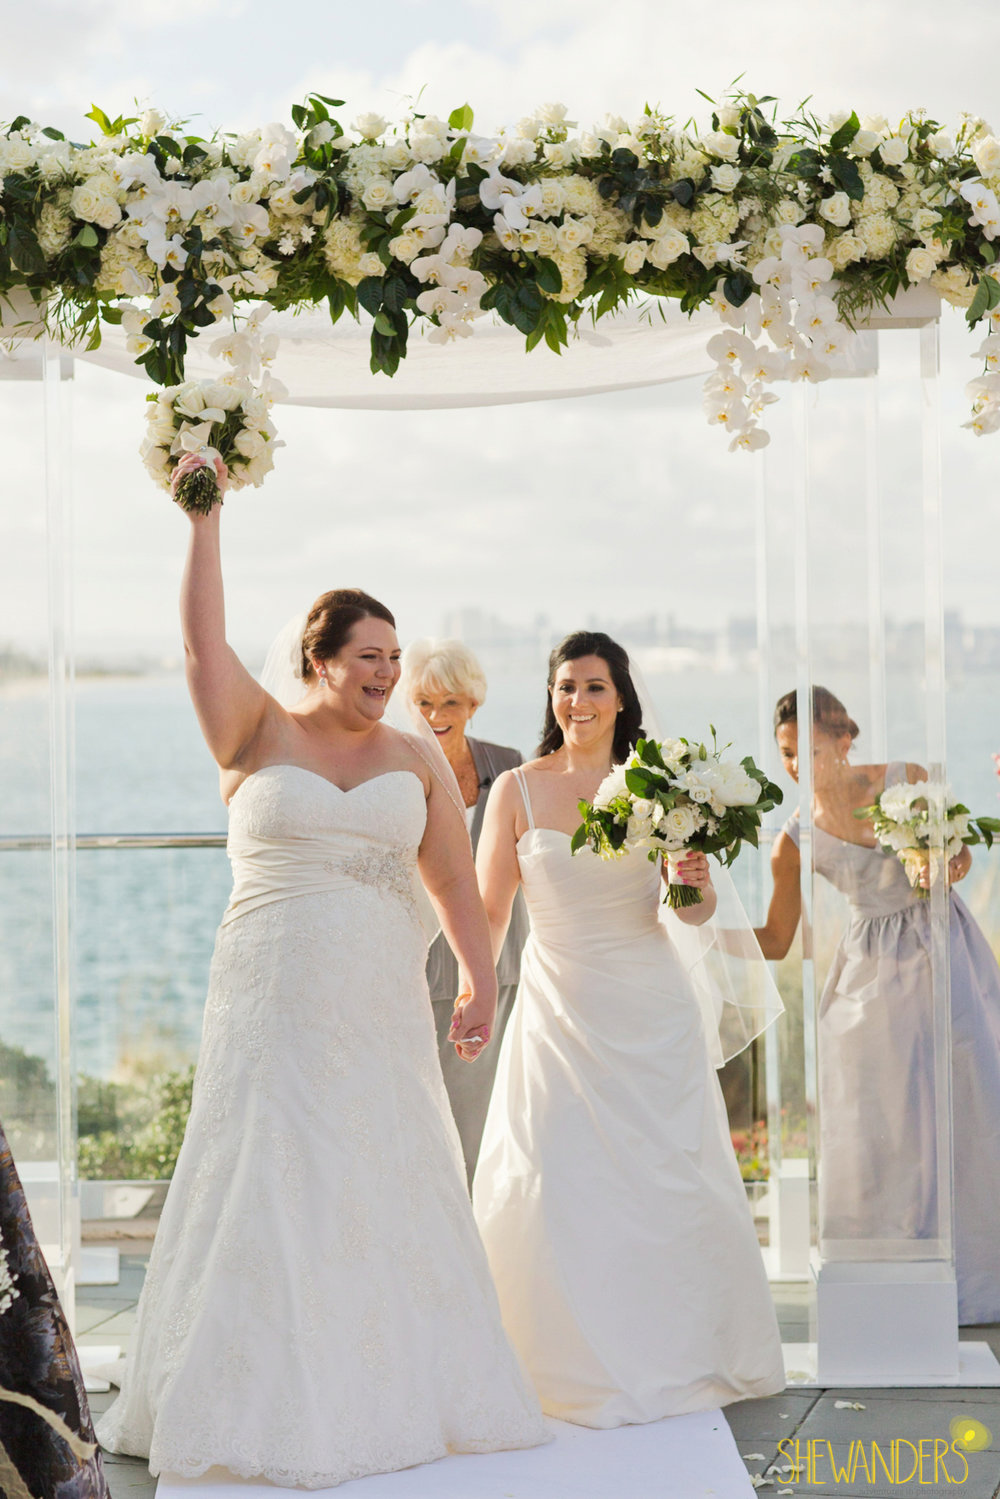 Shewanders.Coronado.Wedding.LaurenJessica-1025.jpg.Wedding.LaurenJessica-1025.jpg